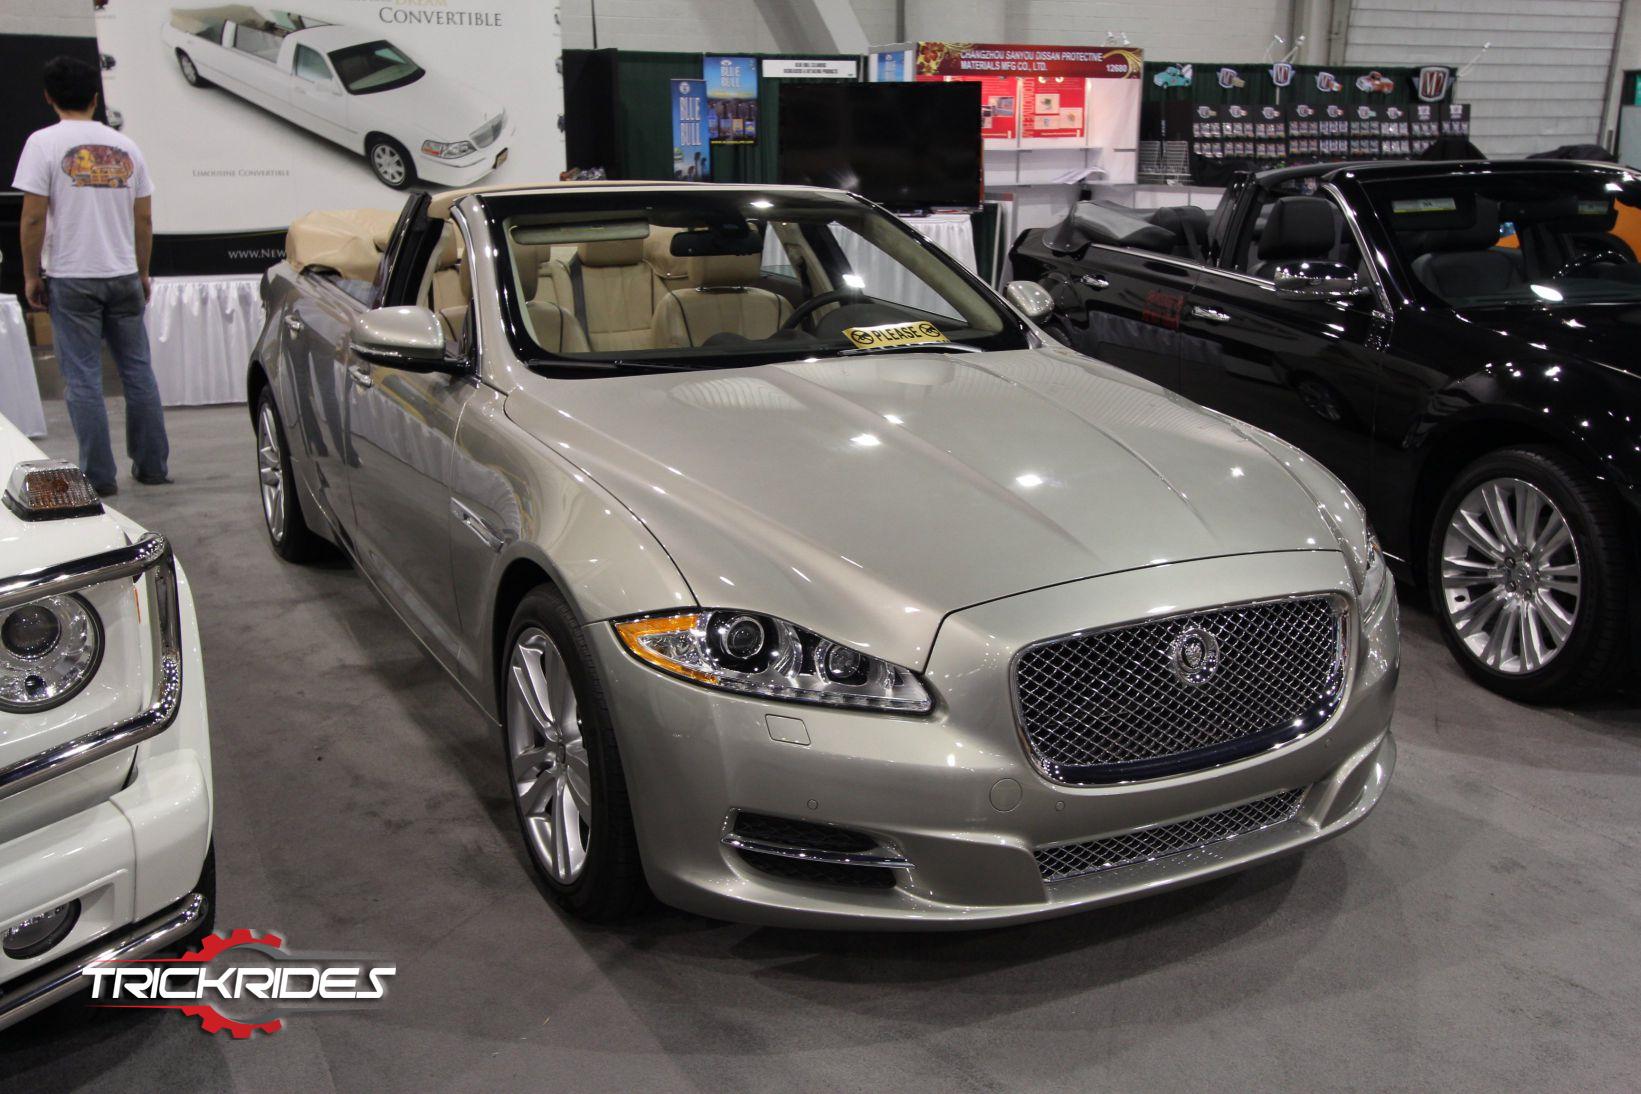 2012 Jaguar XF by Newport Convertible Engineering Inc  at